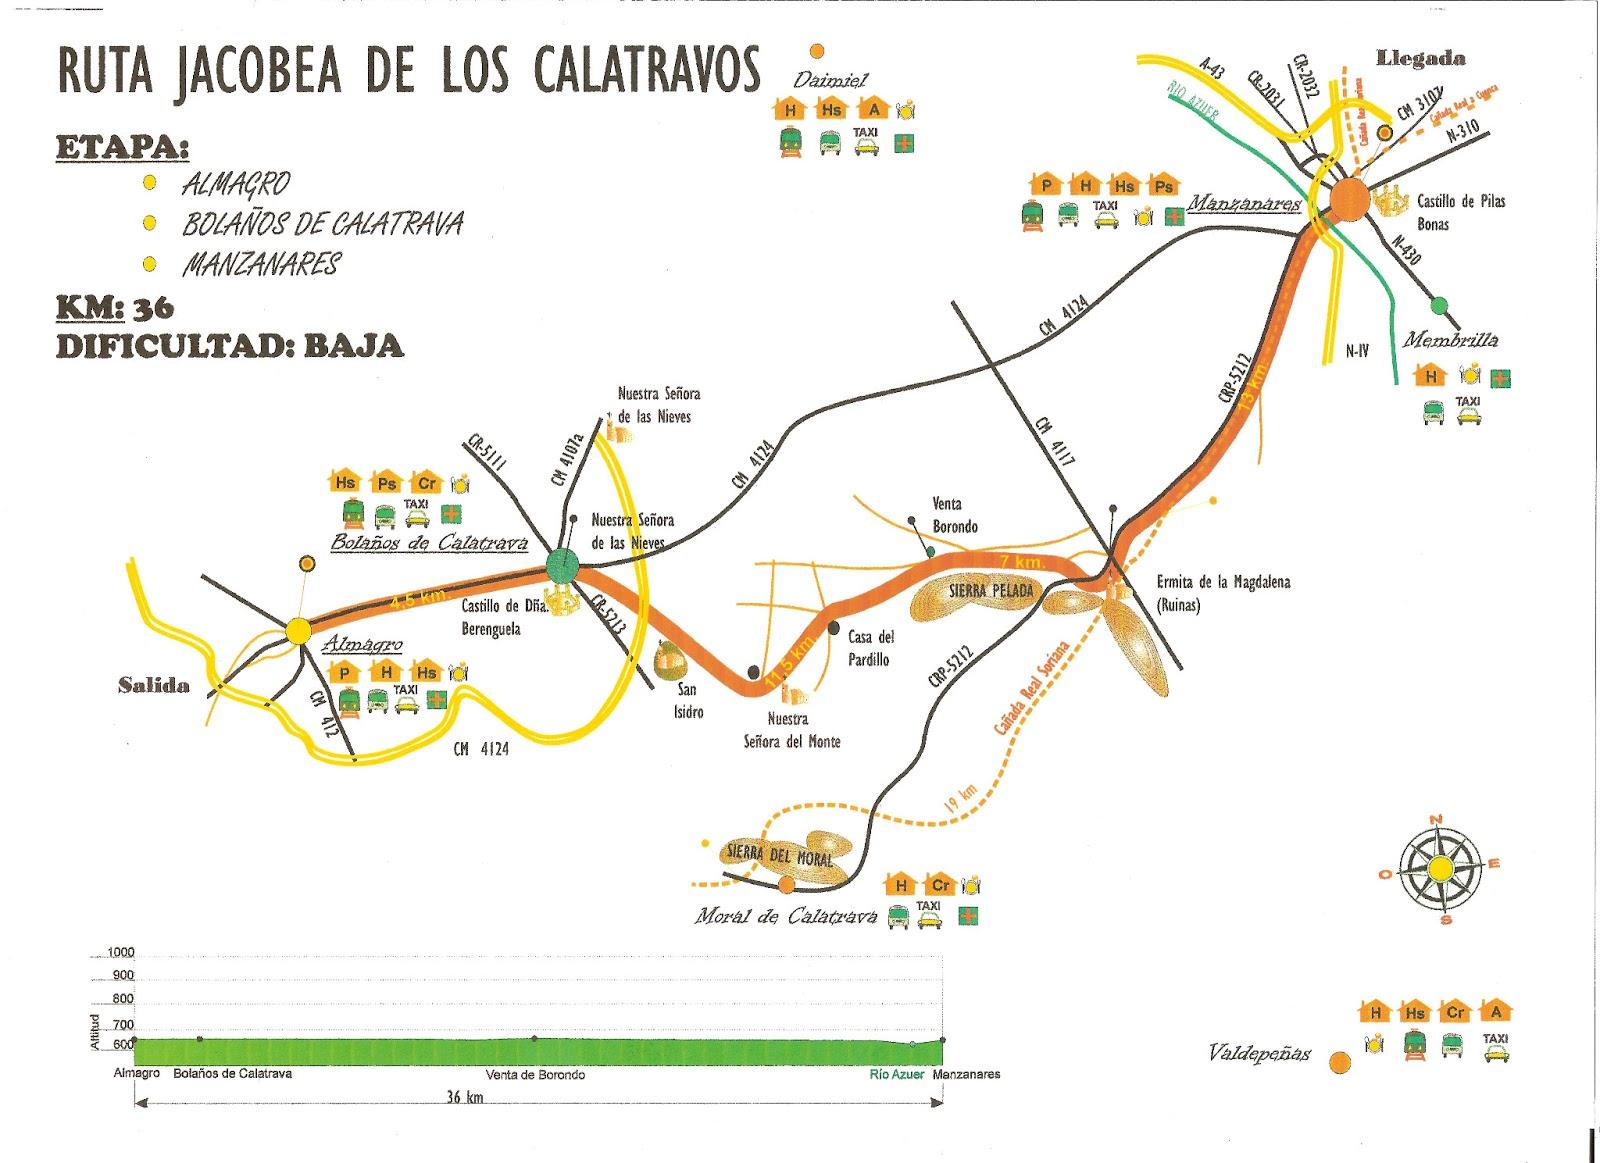 Opiniones de ruta jacobea for Fuera de ruta opiniones